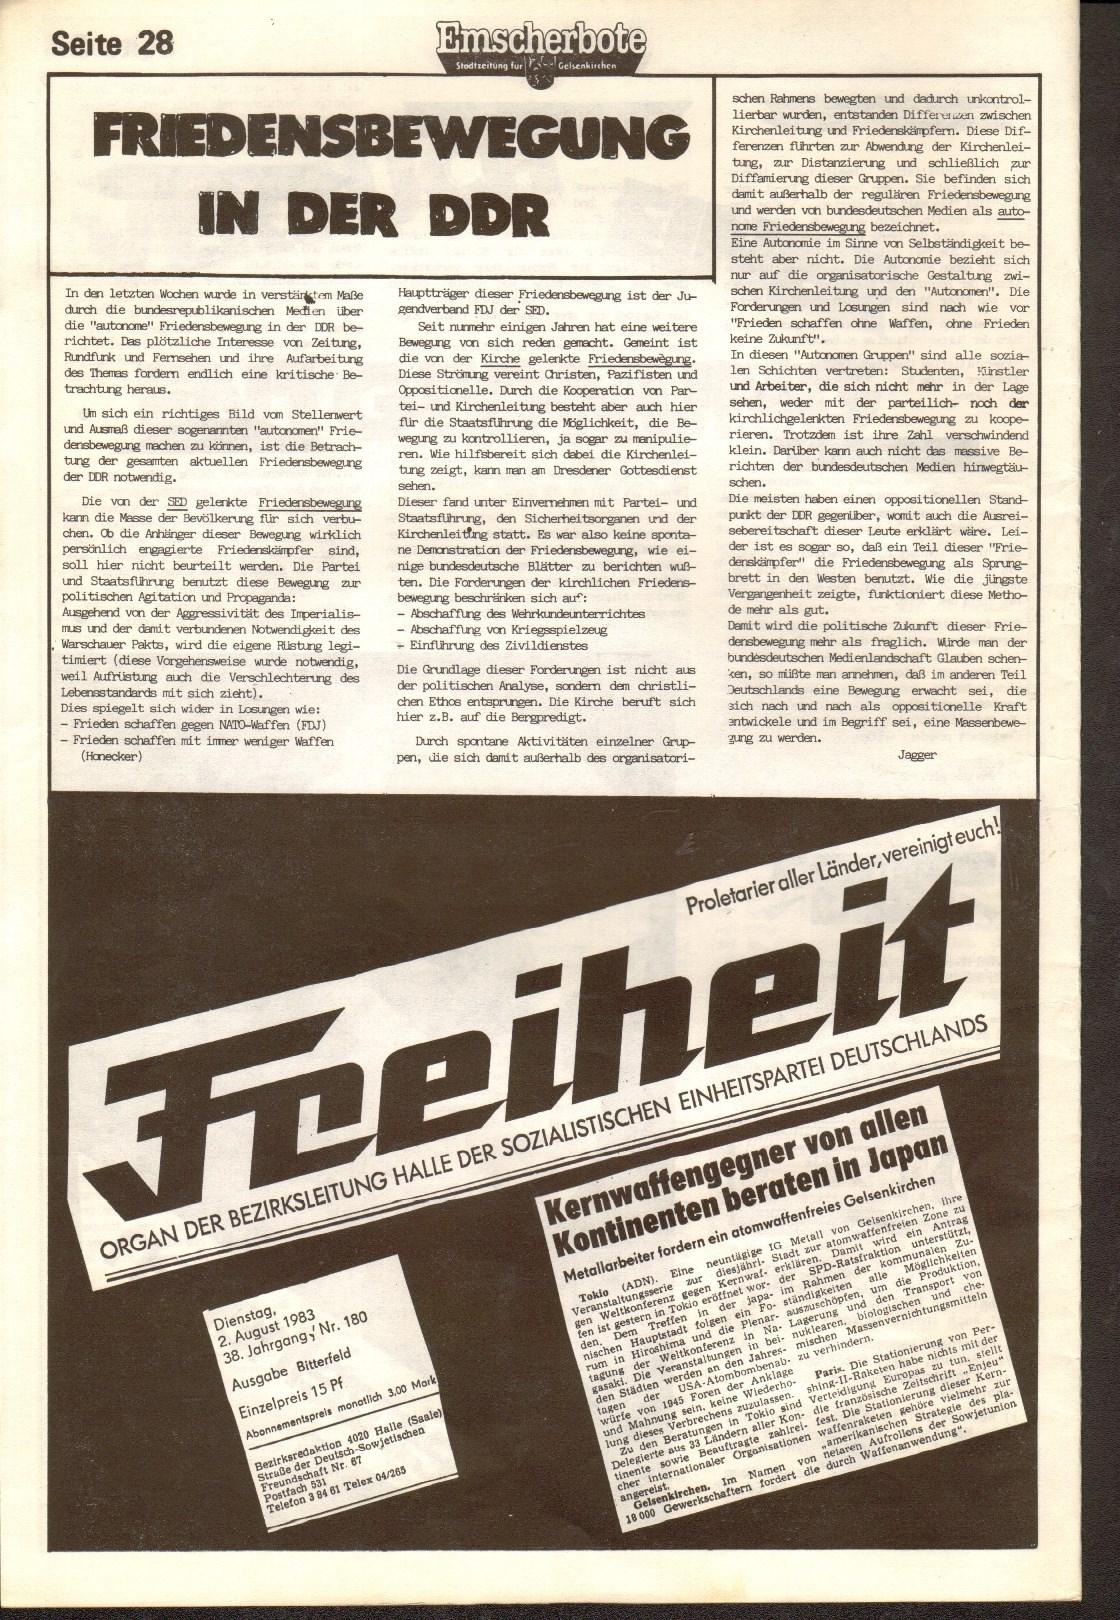 Gelsenkirchen_Emscherbote_1983_31_28